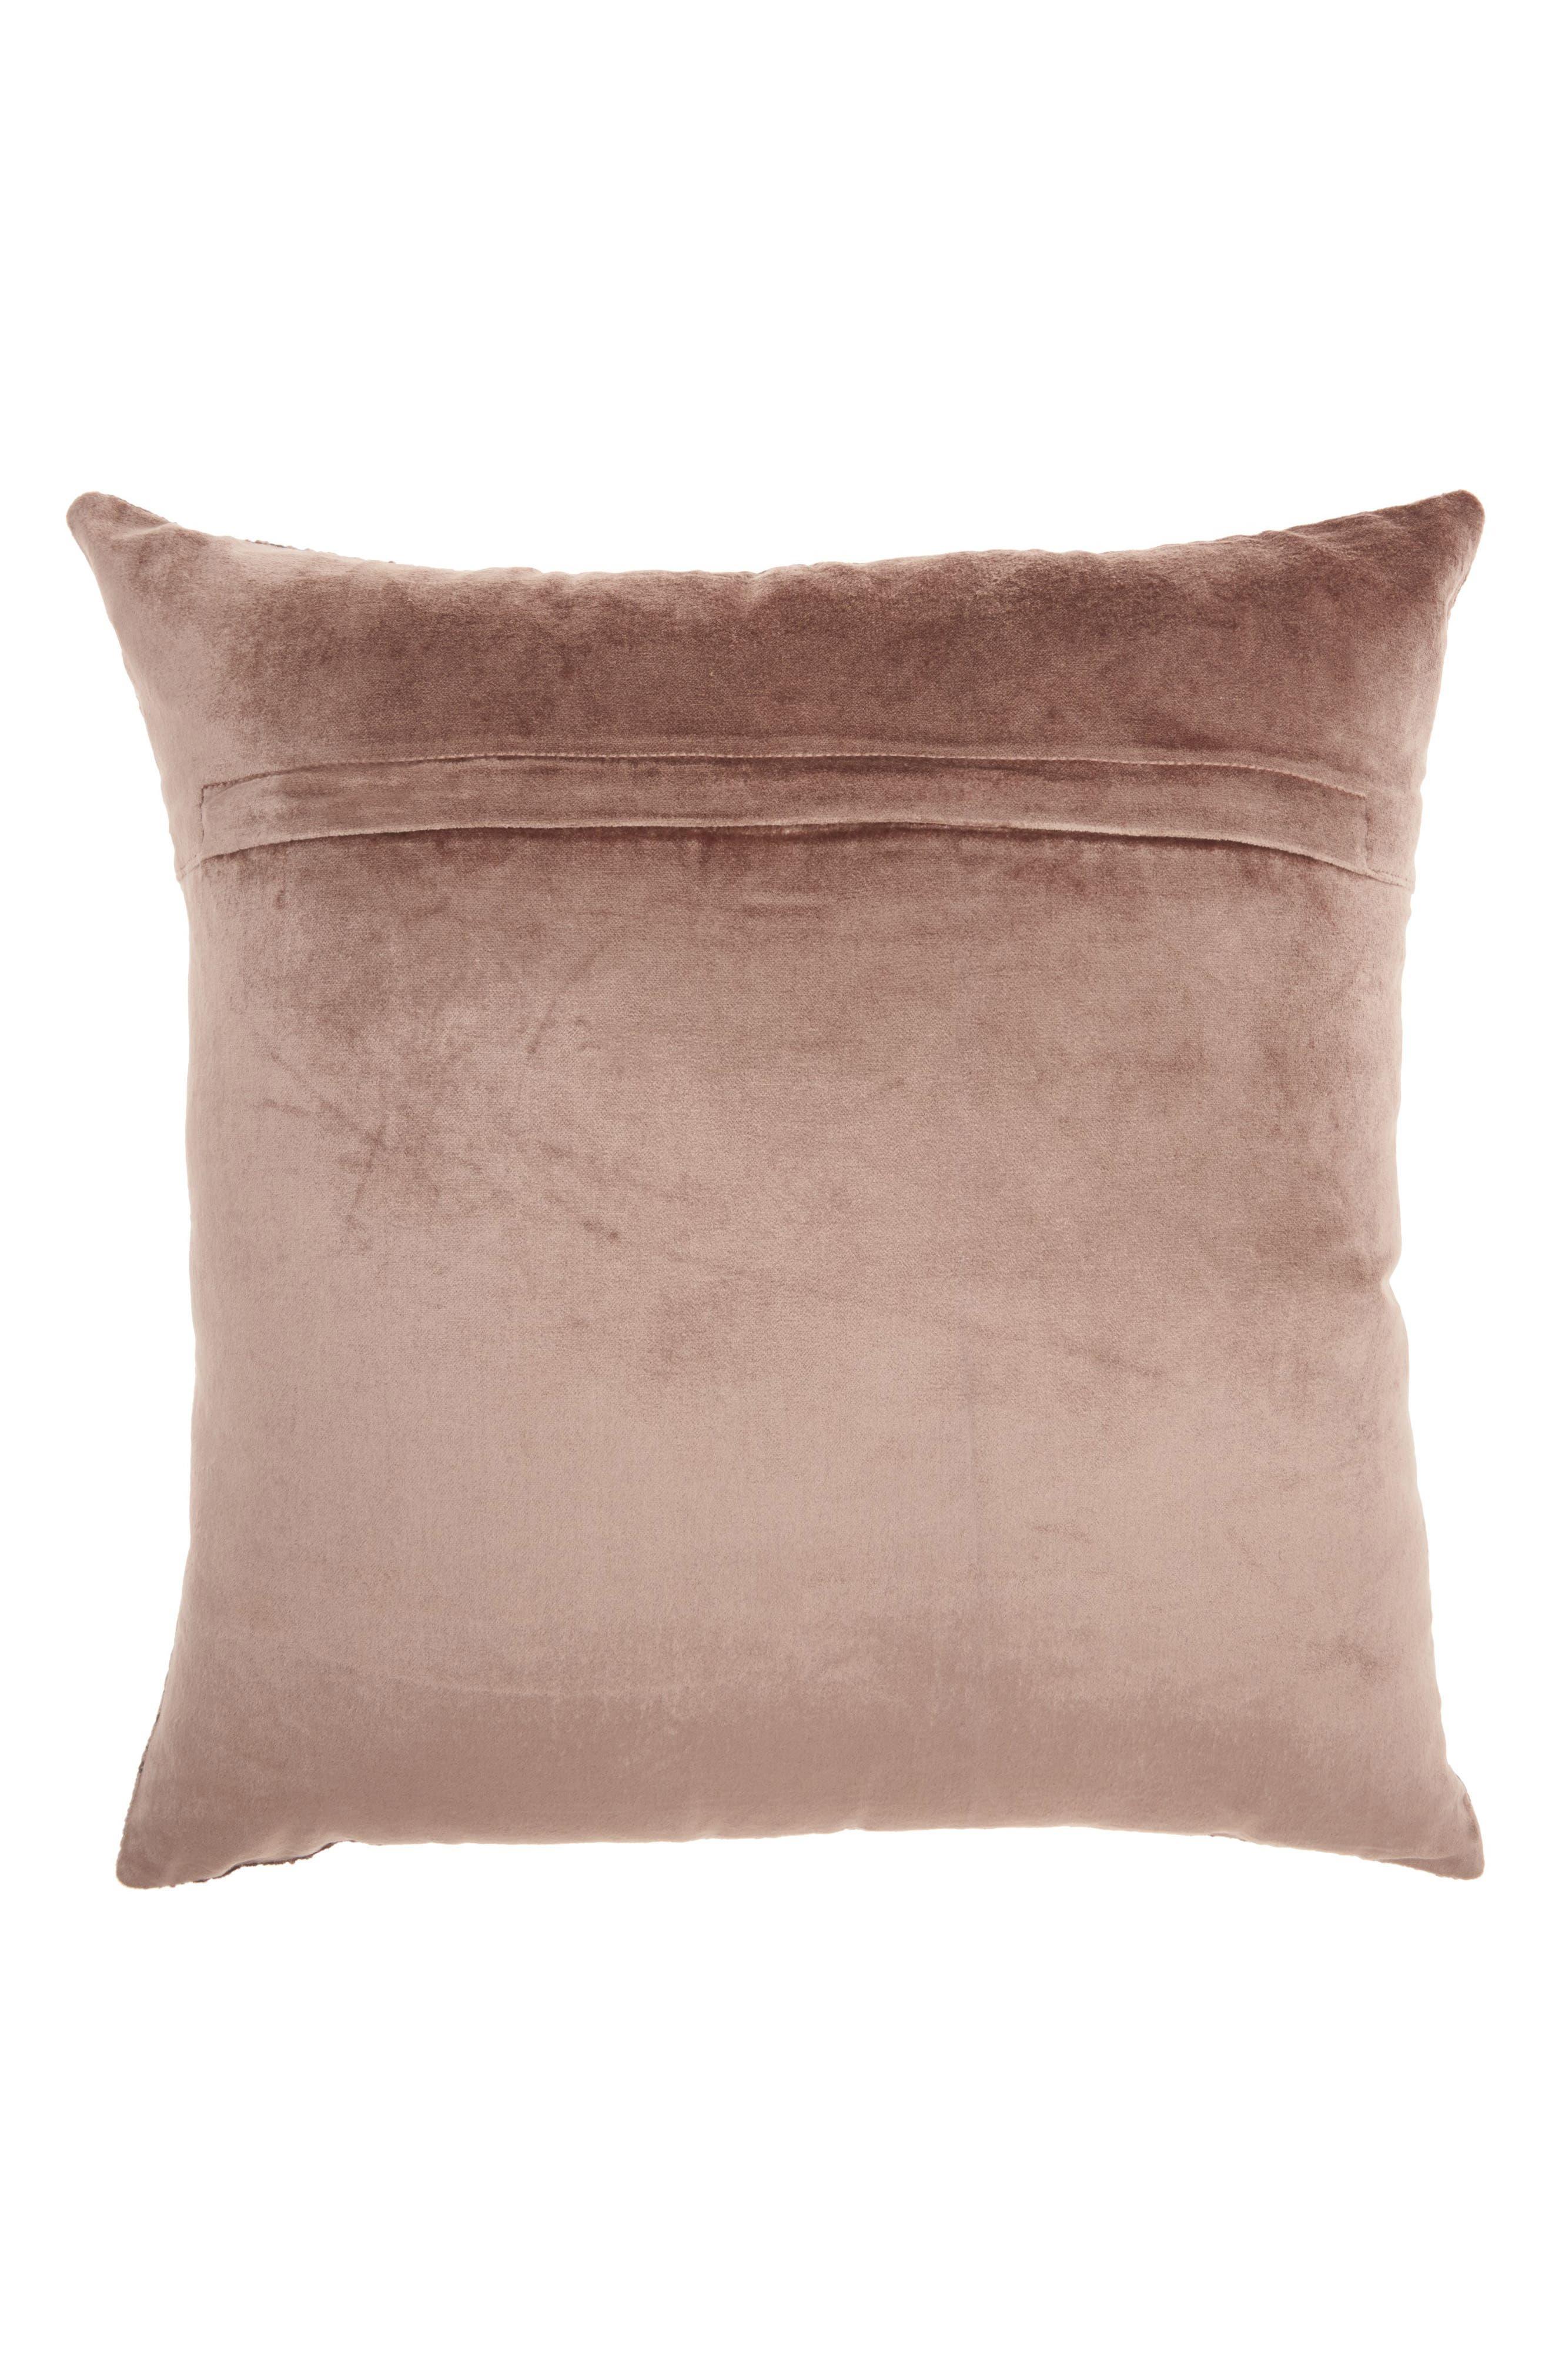 Distressed Velvet Accent Pillow,                             Alternate thumbnail 2, color,                             BEIGE